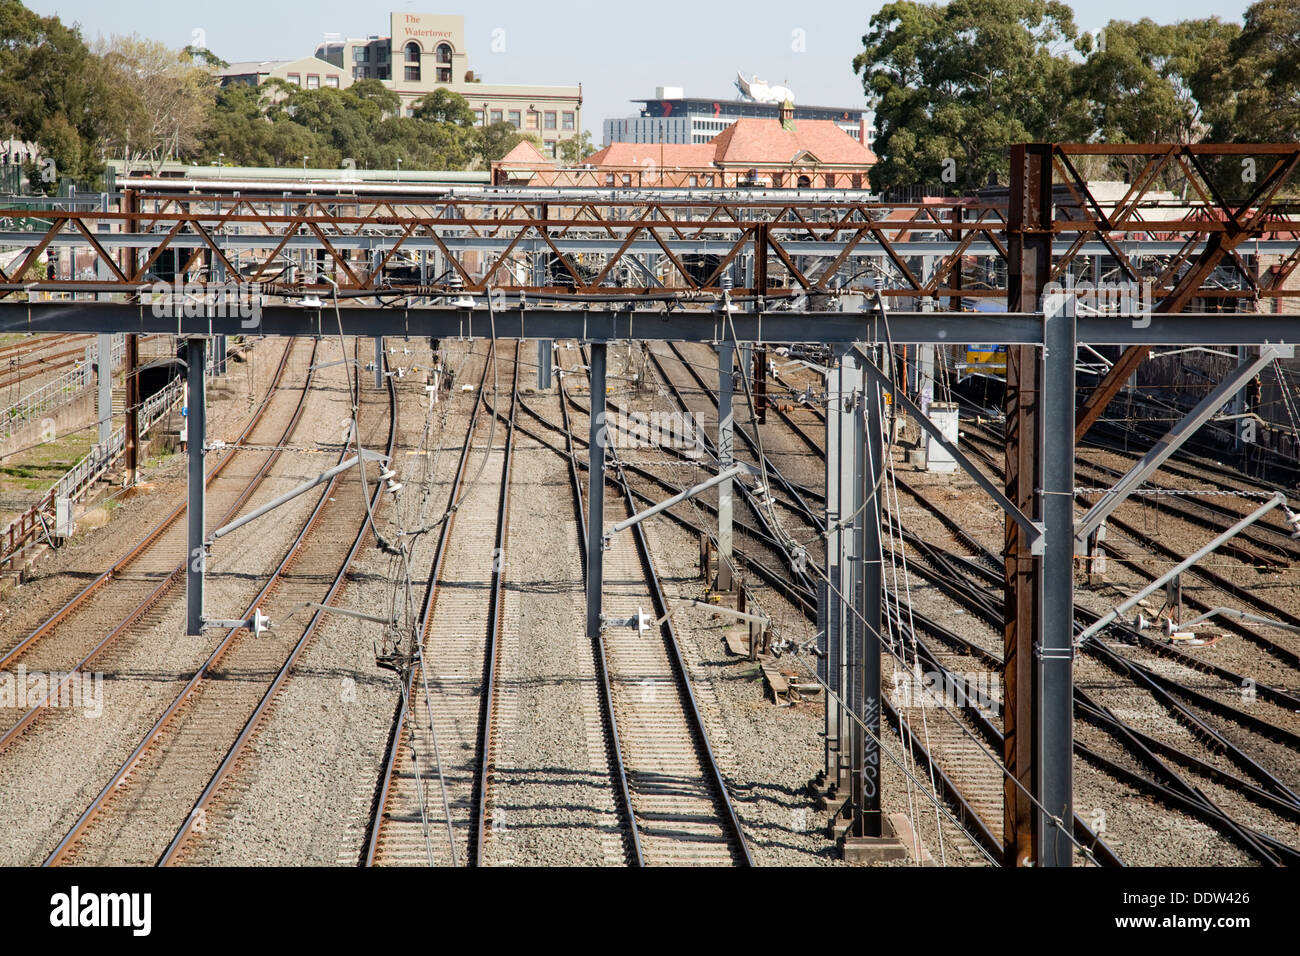 sydney rail network,australia, shot just outside sydney central station - Stock Image